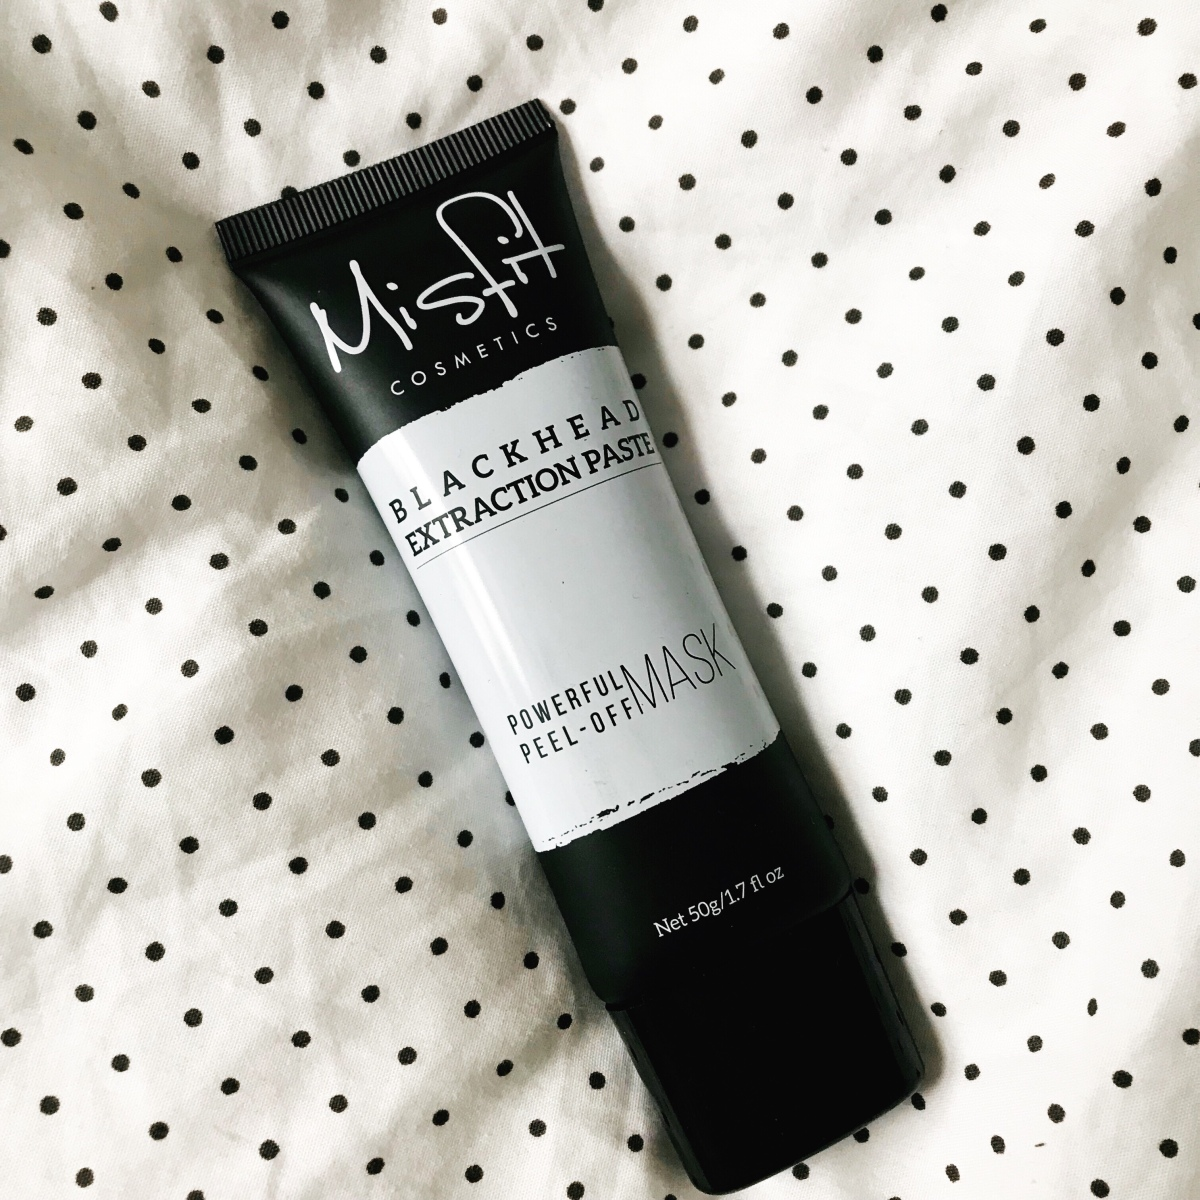 Misfit Cosmetics Black Head Extraction Paste